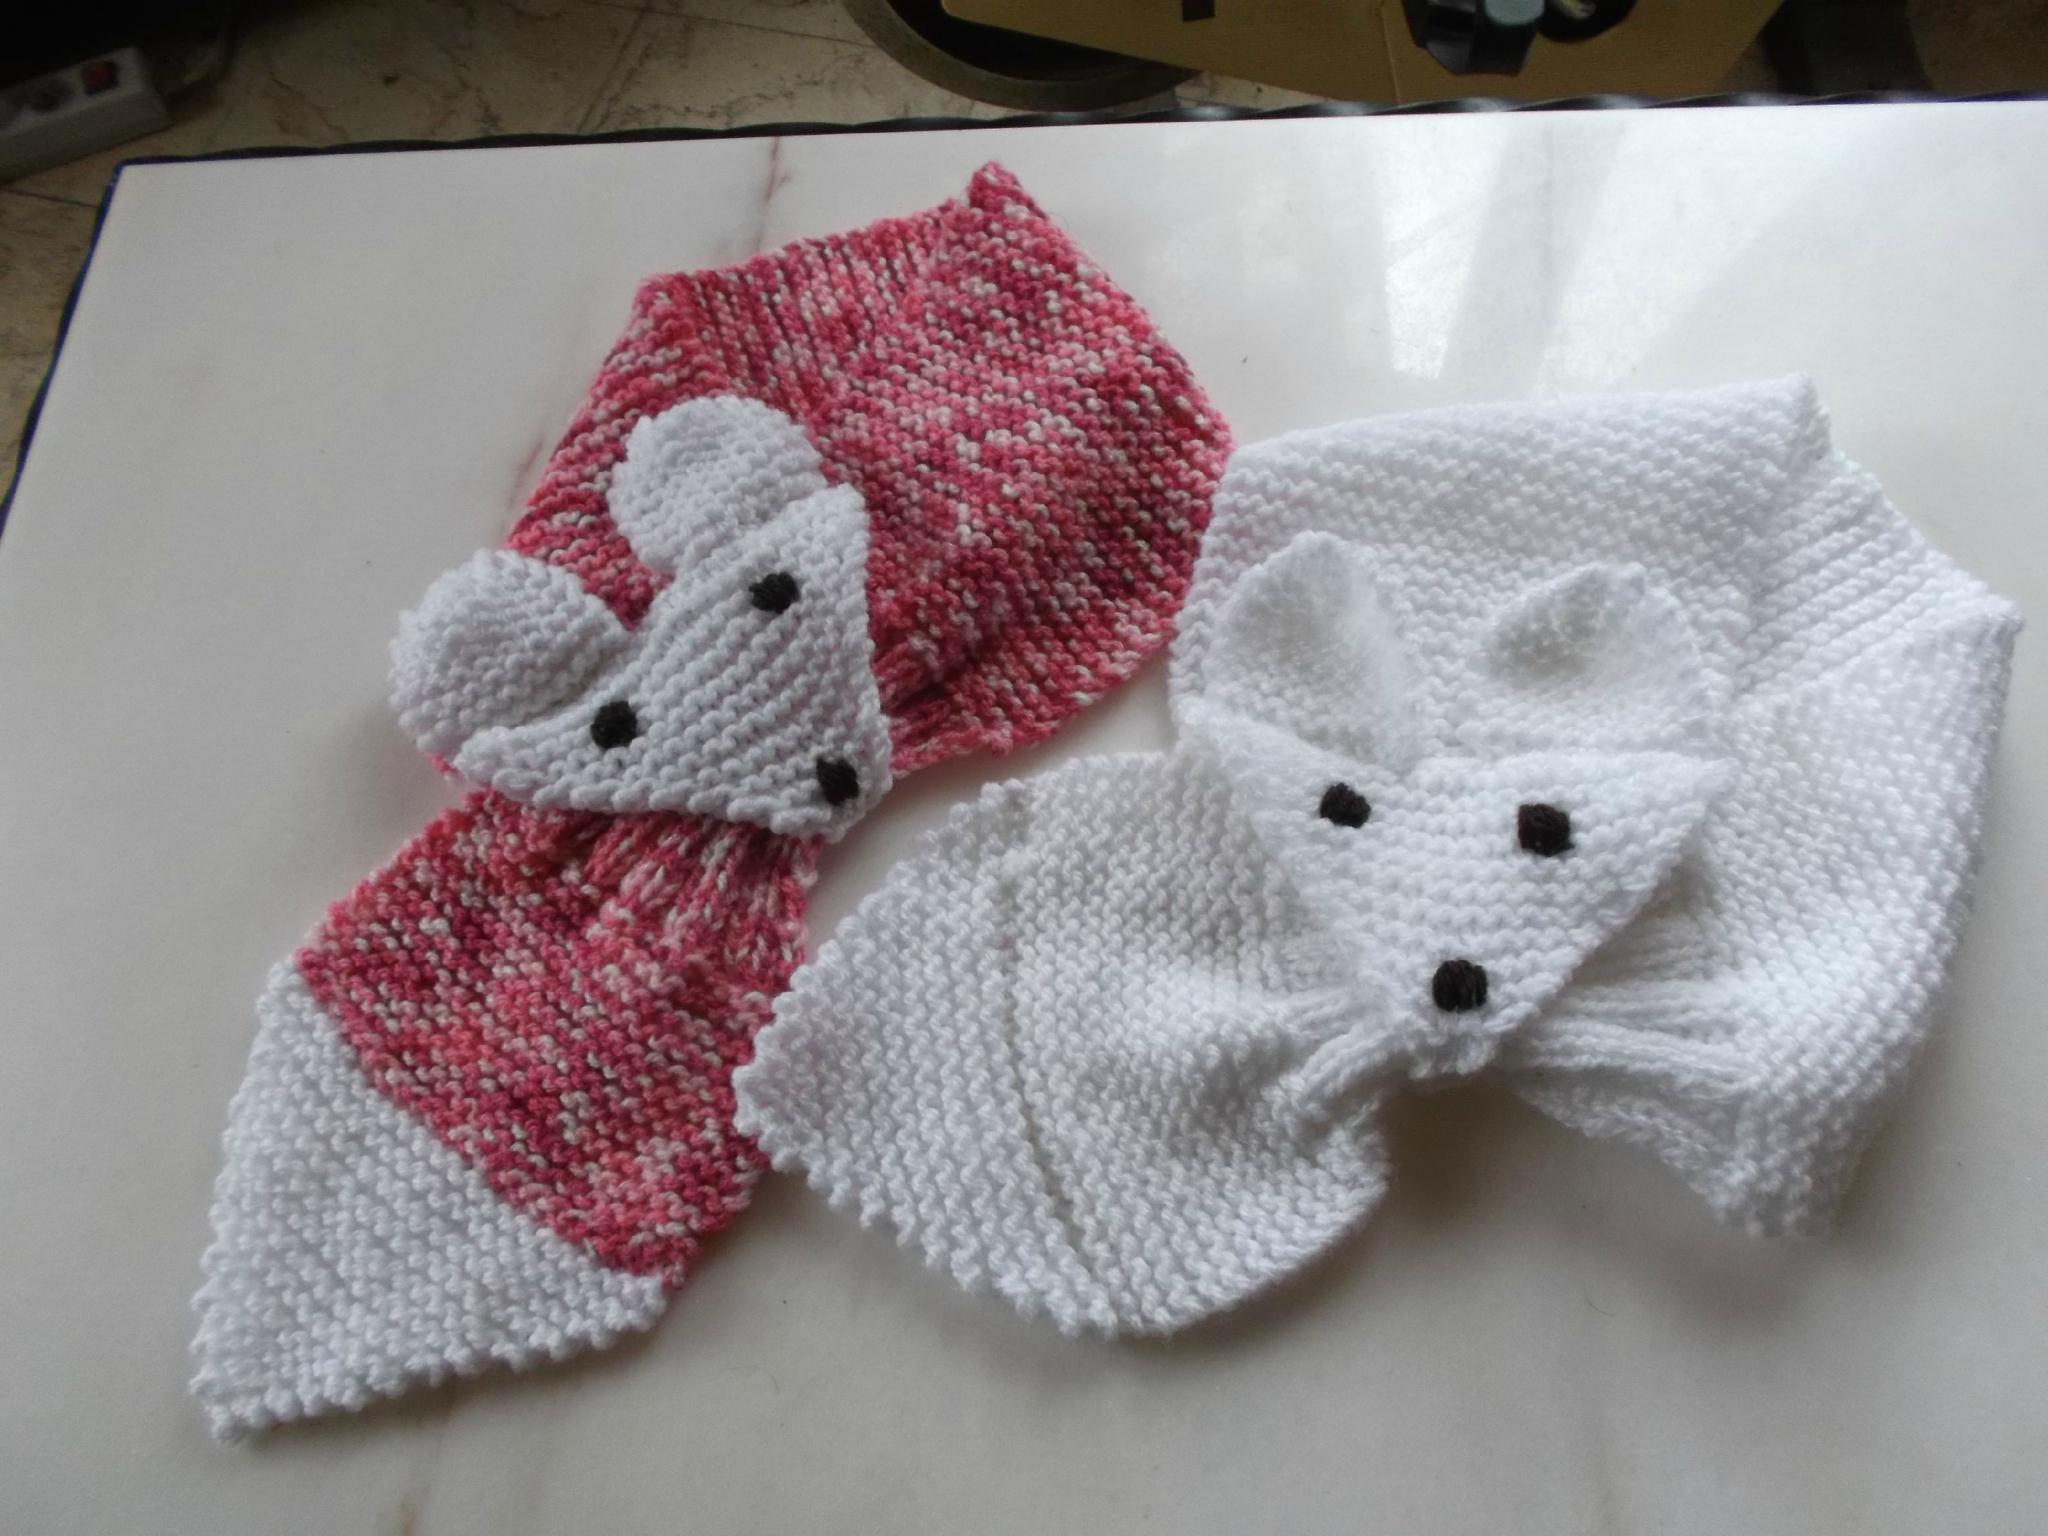 tuto tricot echarpe bebe